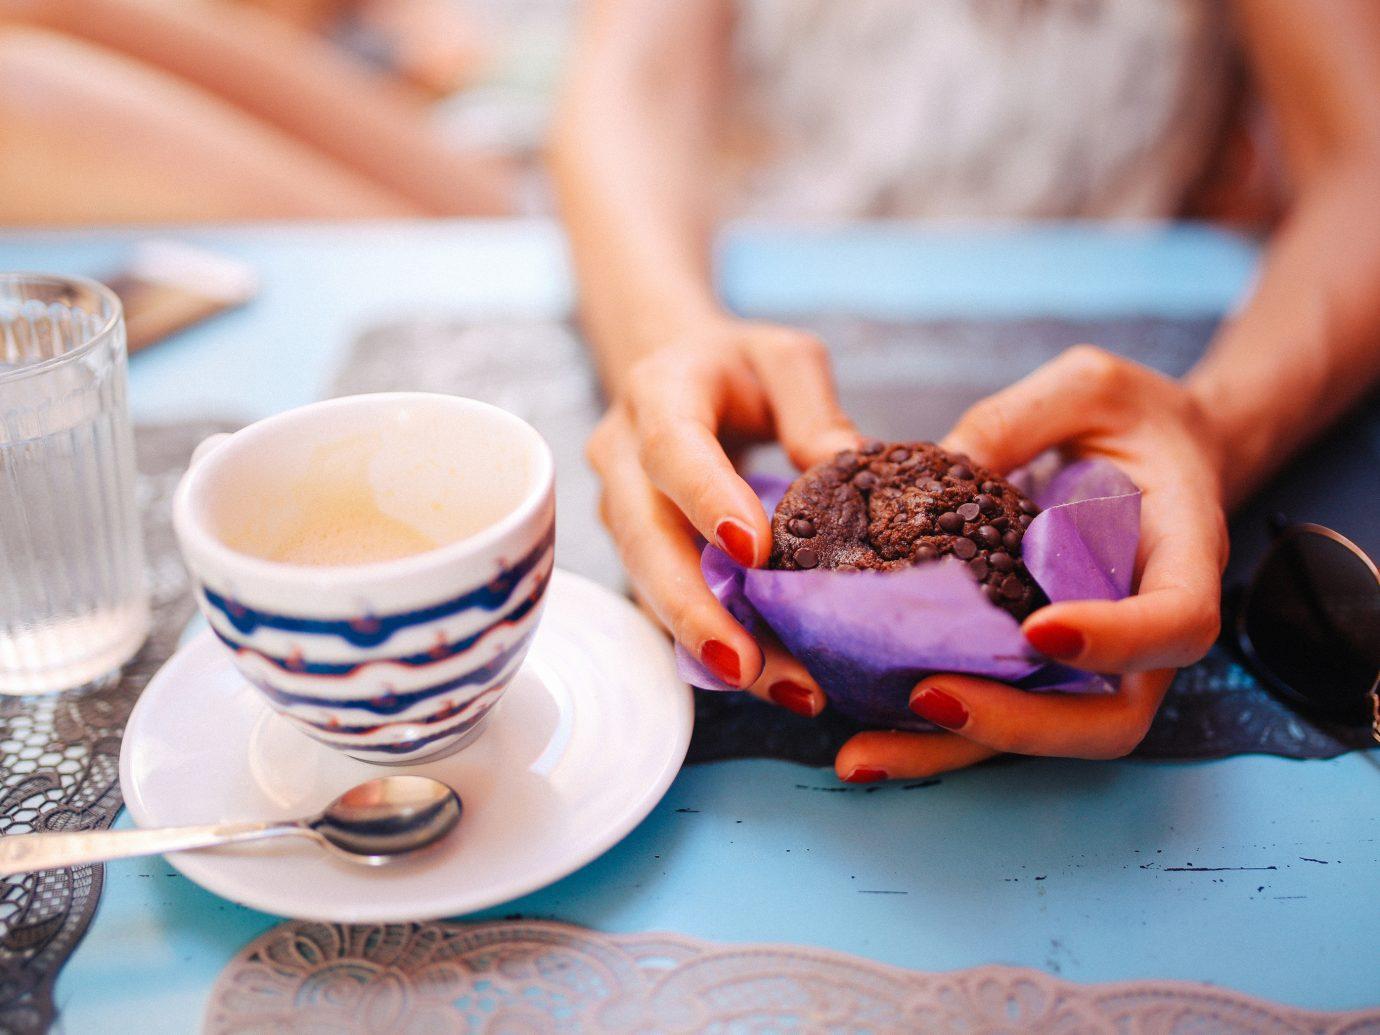 Trip Ideas person cup meal food breakfast eating sense baking flavor sweetness brunch